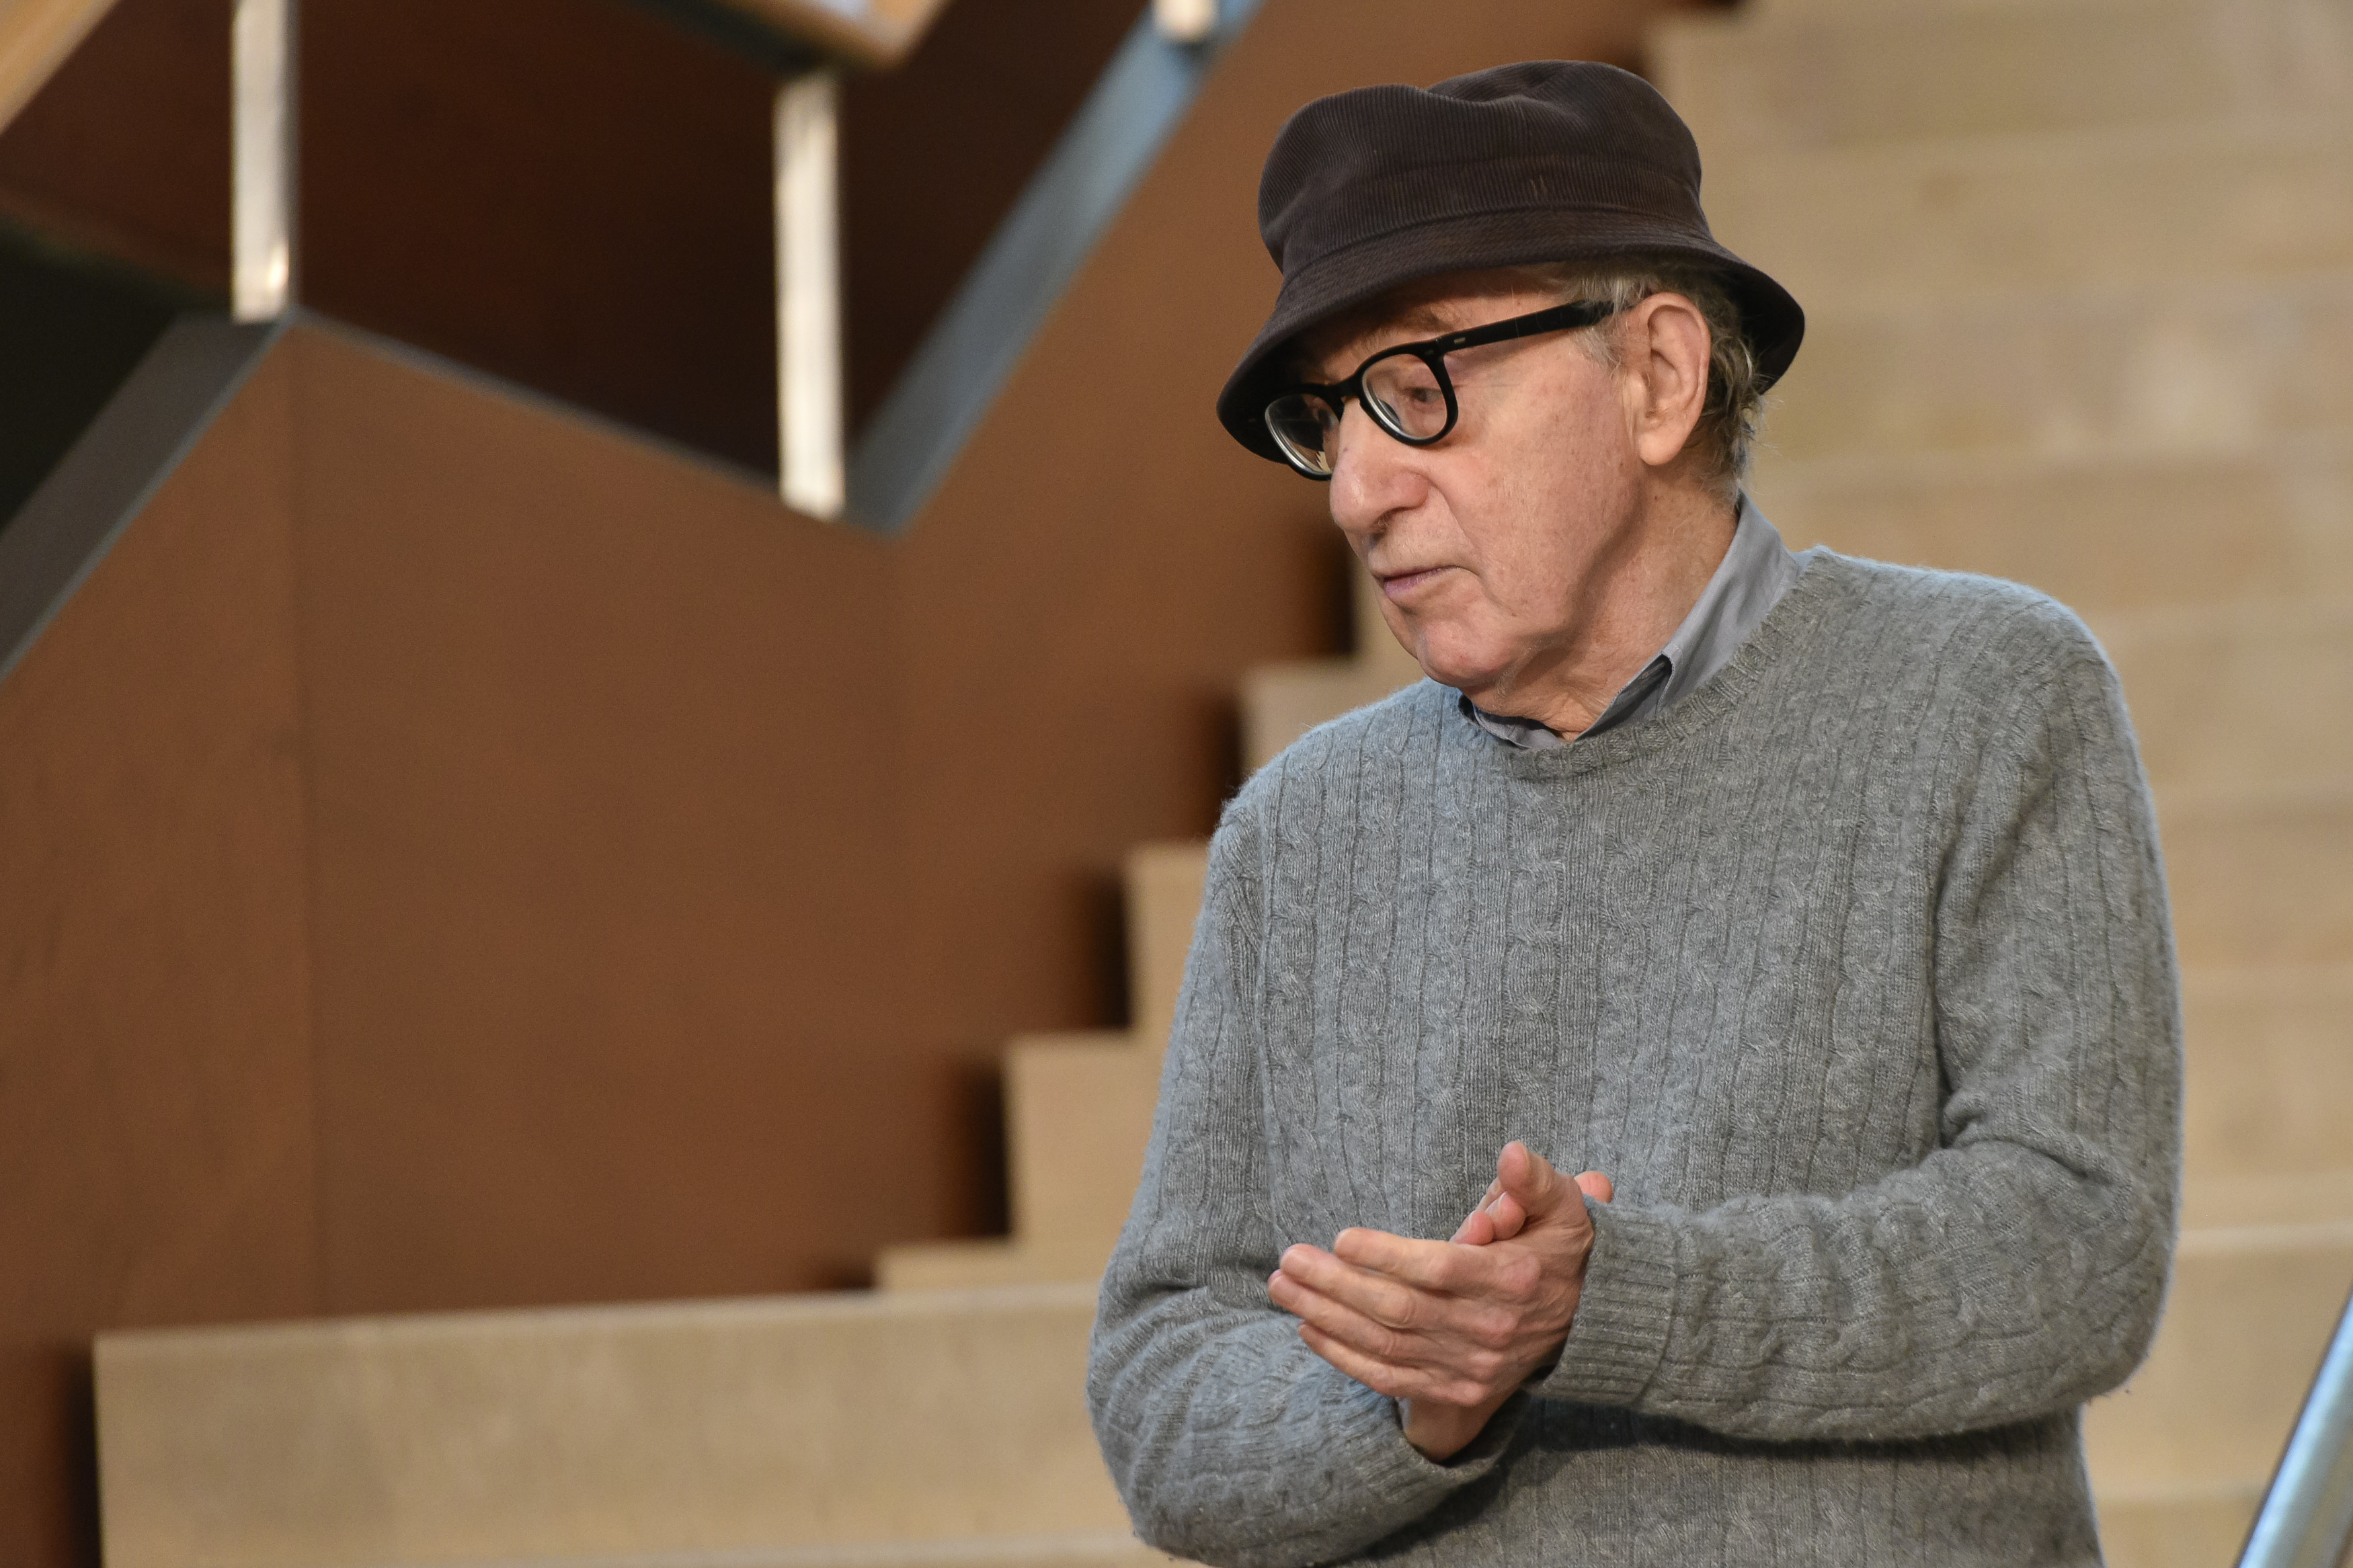 SAN SEBASTIÁN - JULY 09: Director Woody Allen starts filming a new movie in San Sebastián on July 09, 2019 in San Sebastián, Spain. (Photo by UNANUE/Europa Press via Getty Images) (Photo by Europa Press News/Europa Press via Getty Images )